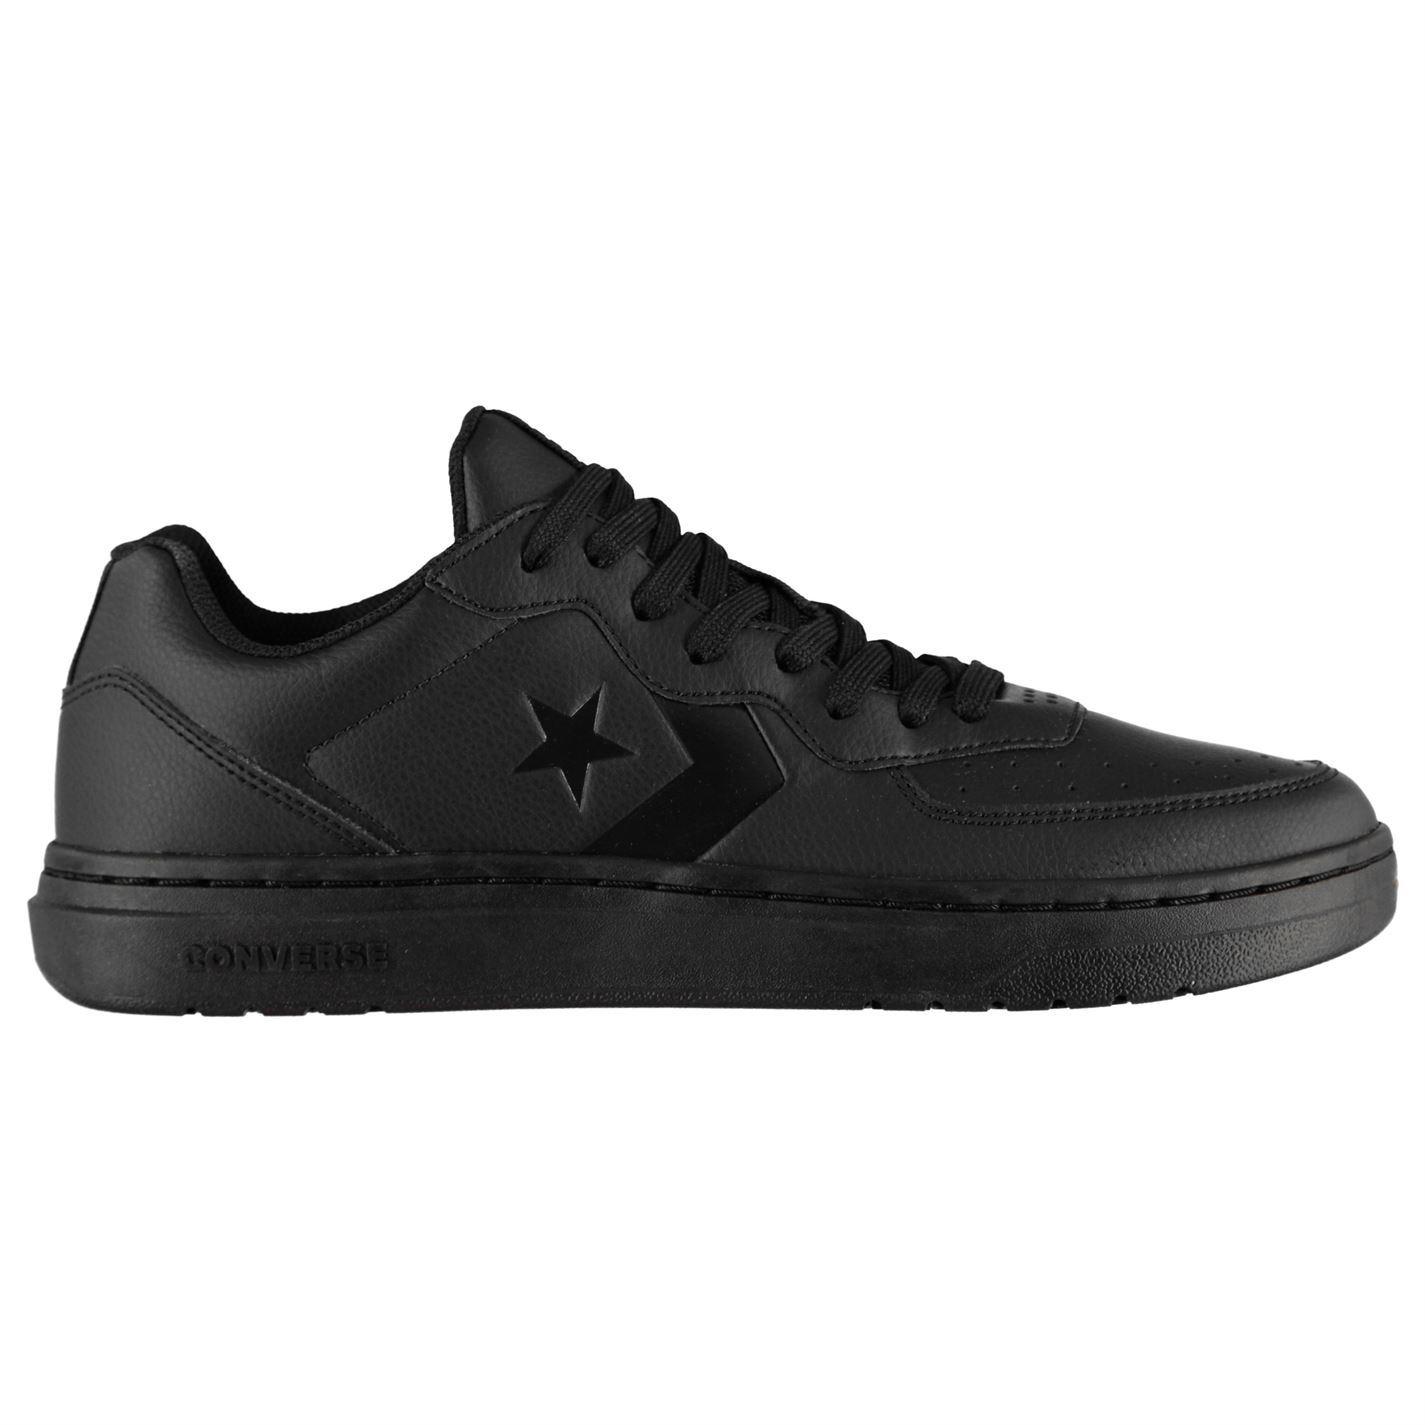 Converse-Ox-Rival-Cuir-Baskets-Pour-Homme-Chaussures-De-Loisirs-Chaussures-Baskets miniature 5